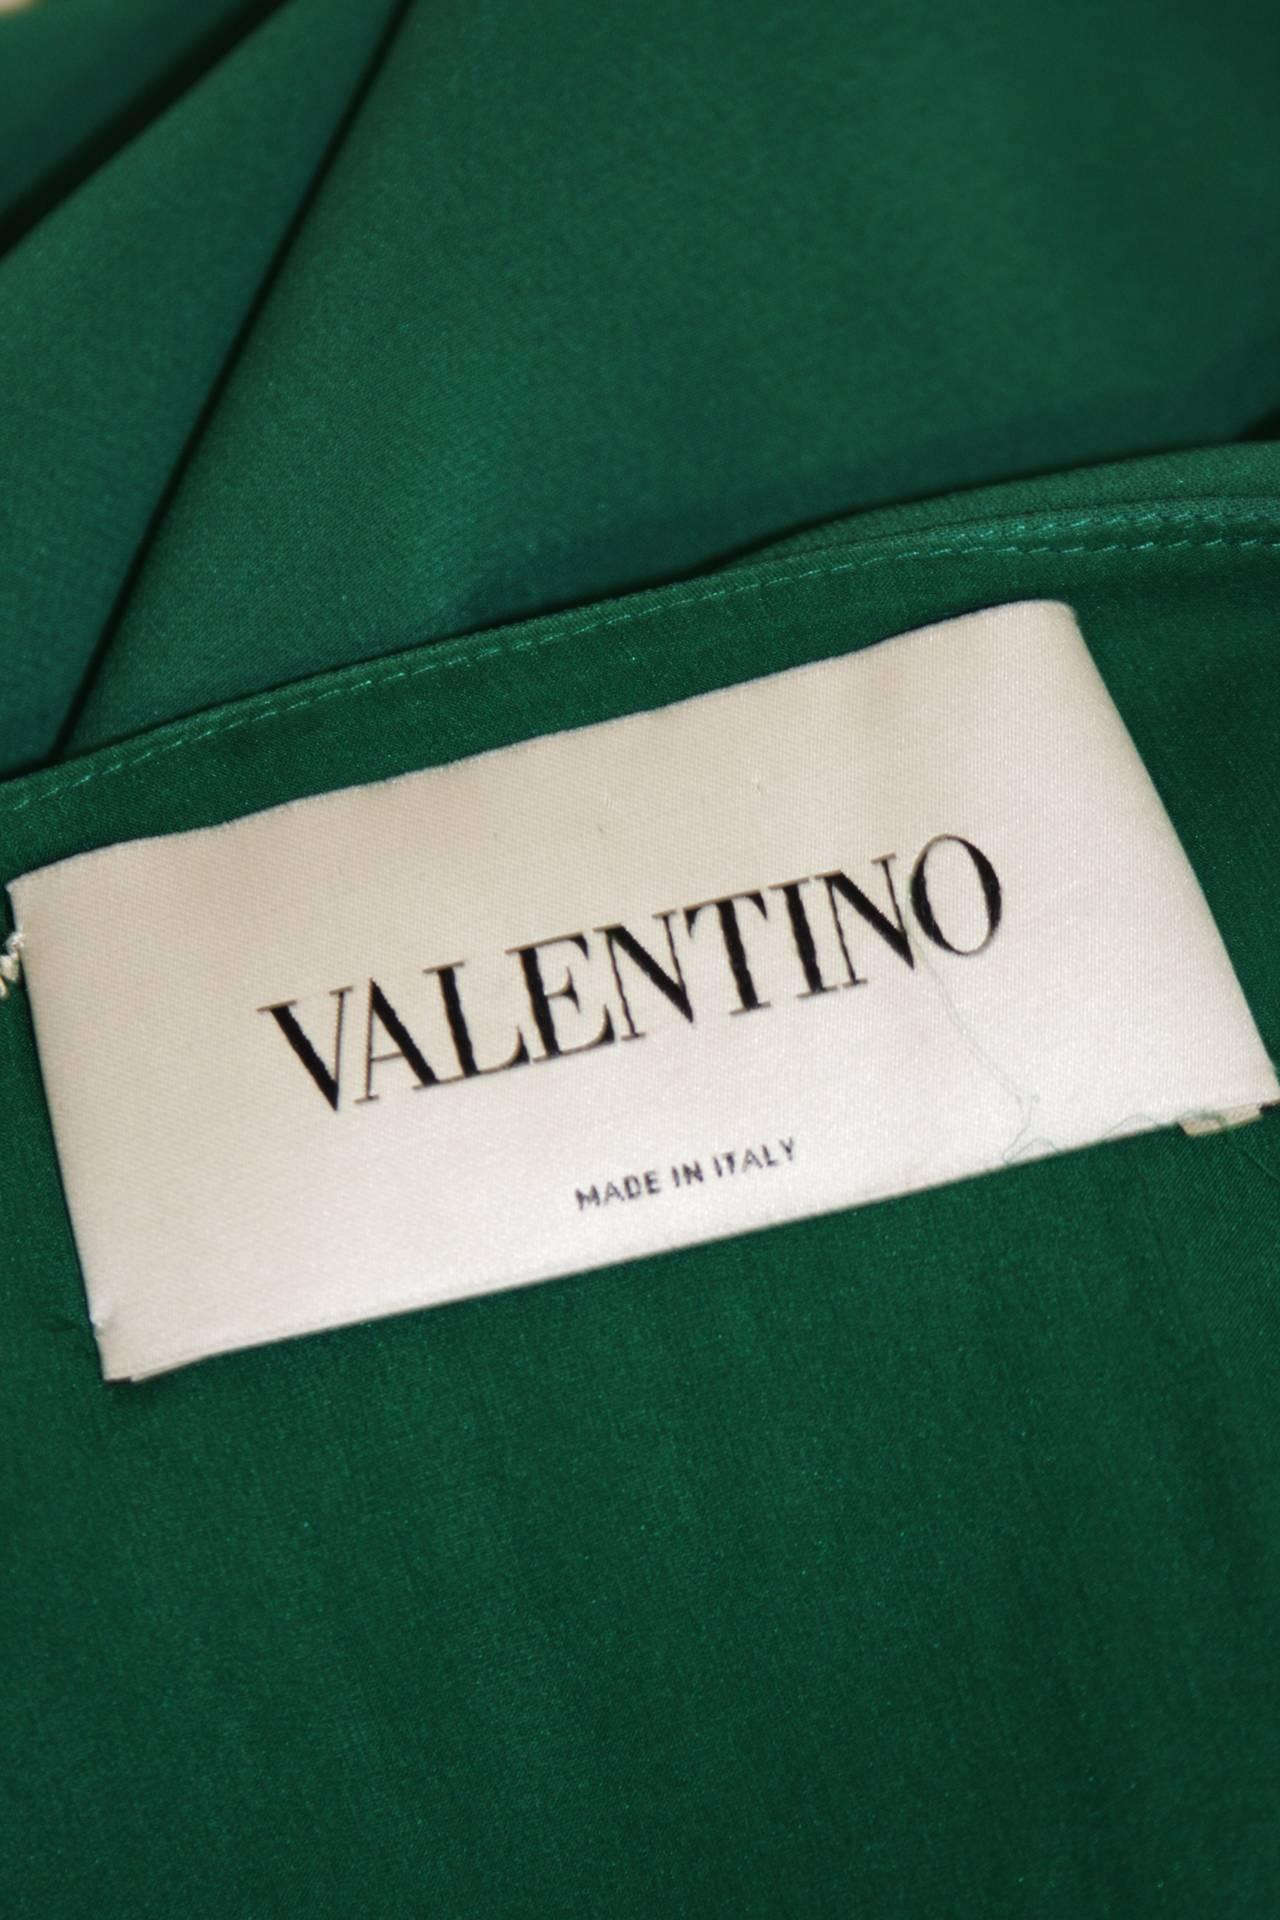 Valentino Green Silk Cocktail Dress with Plunge Neckline Size 8 For Sale 3